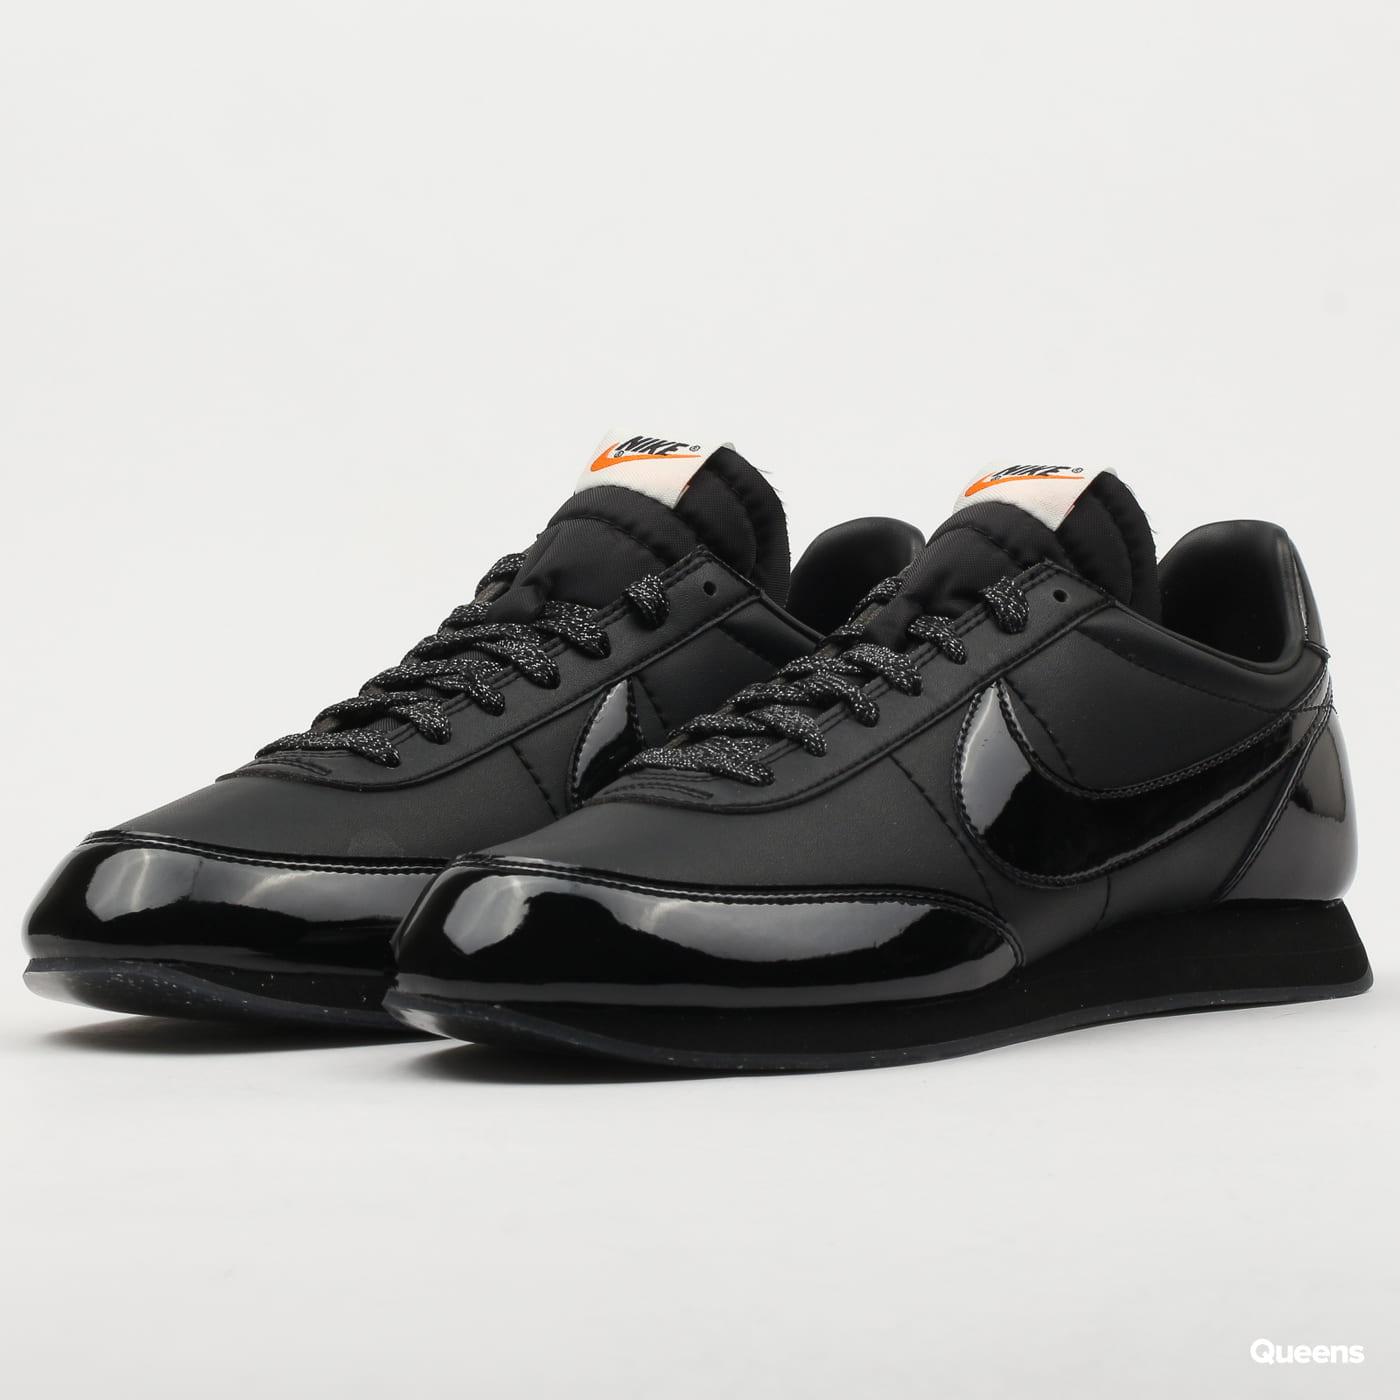 477d0ed9ca939 Obuv Nike Nighttrack / CDG black / black - white (AQ3695-001) – Queens 💚